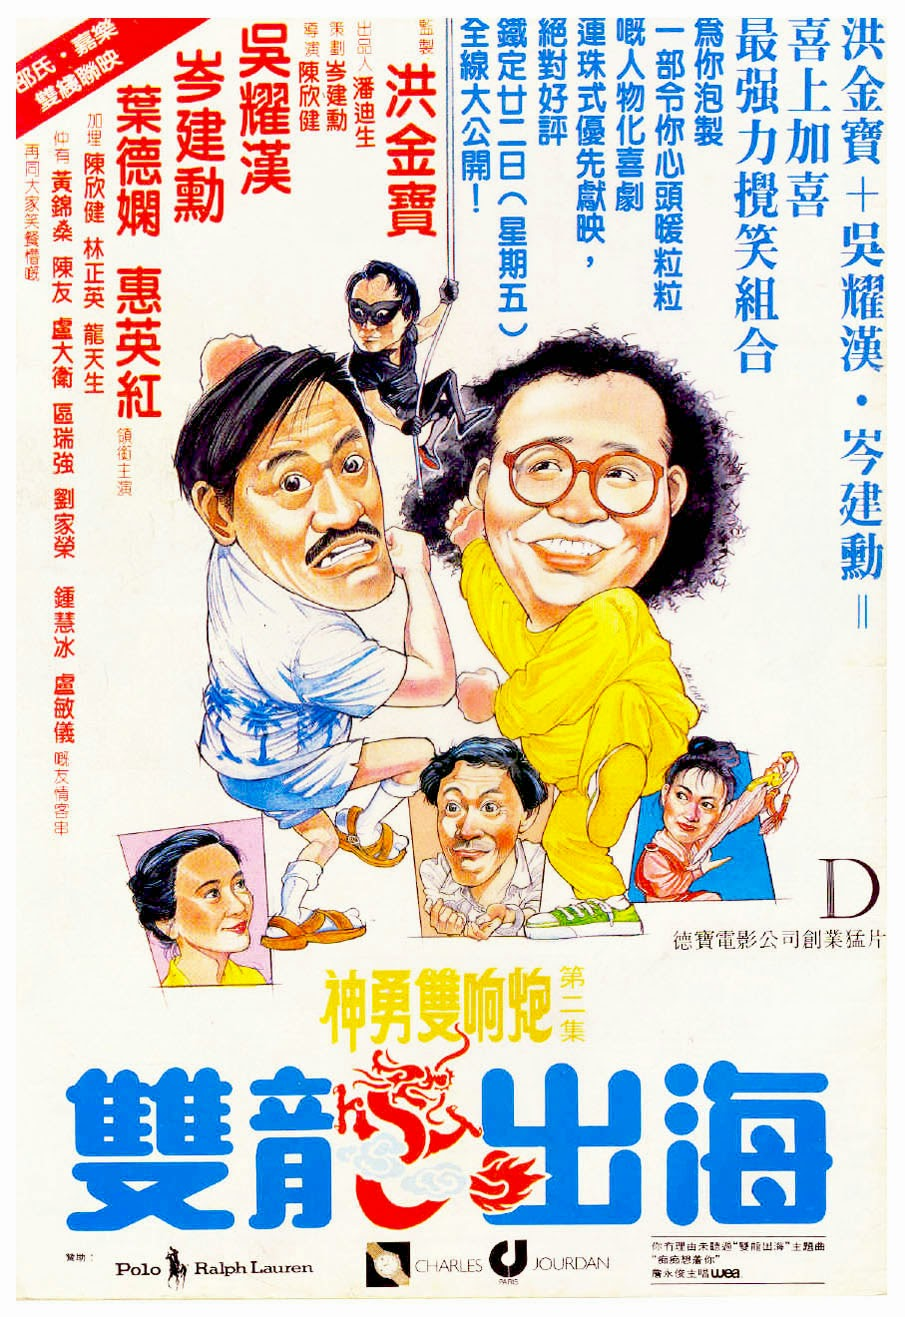 Seung lung chut hoi (1984)